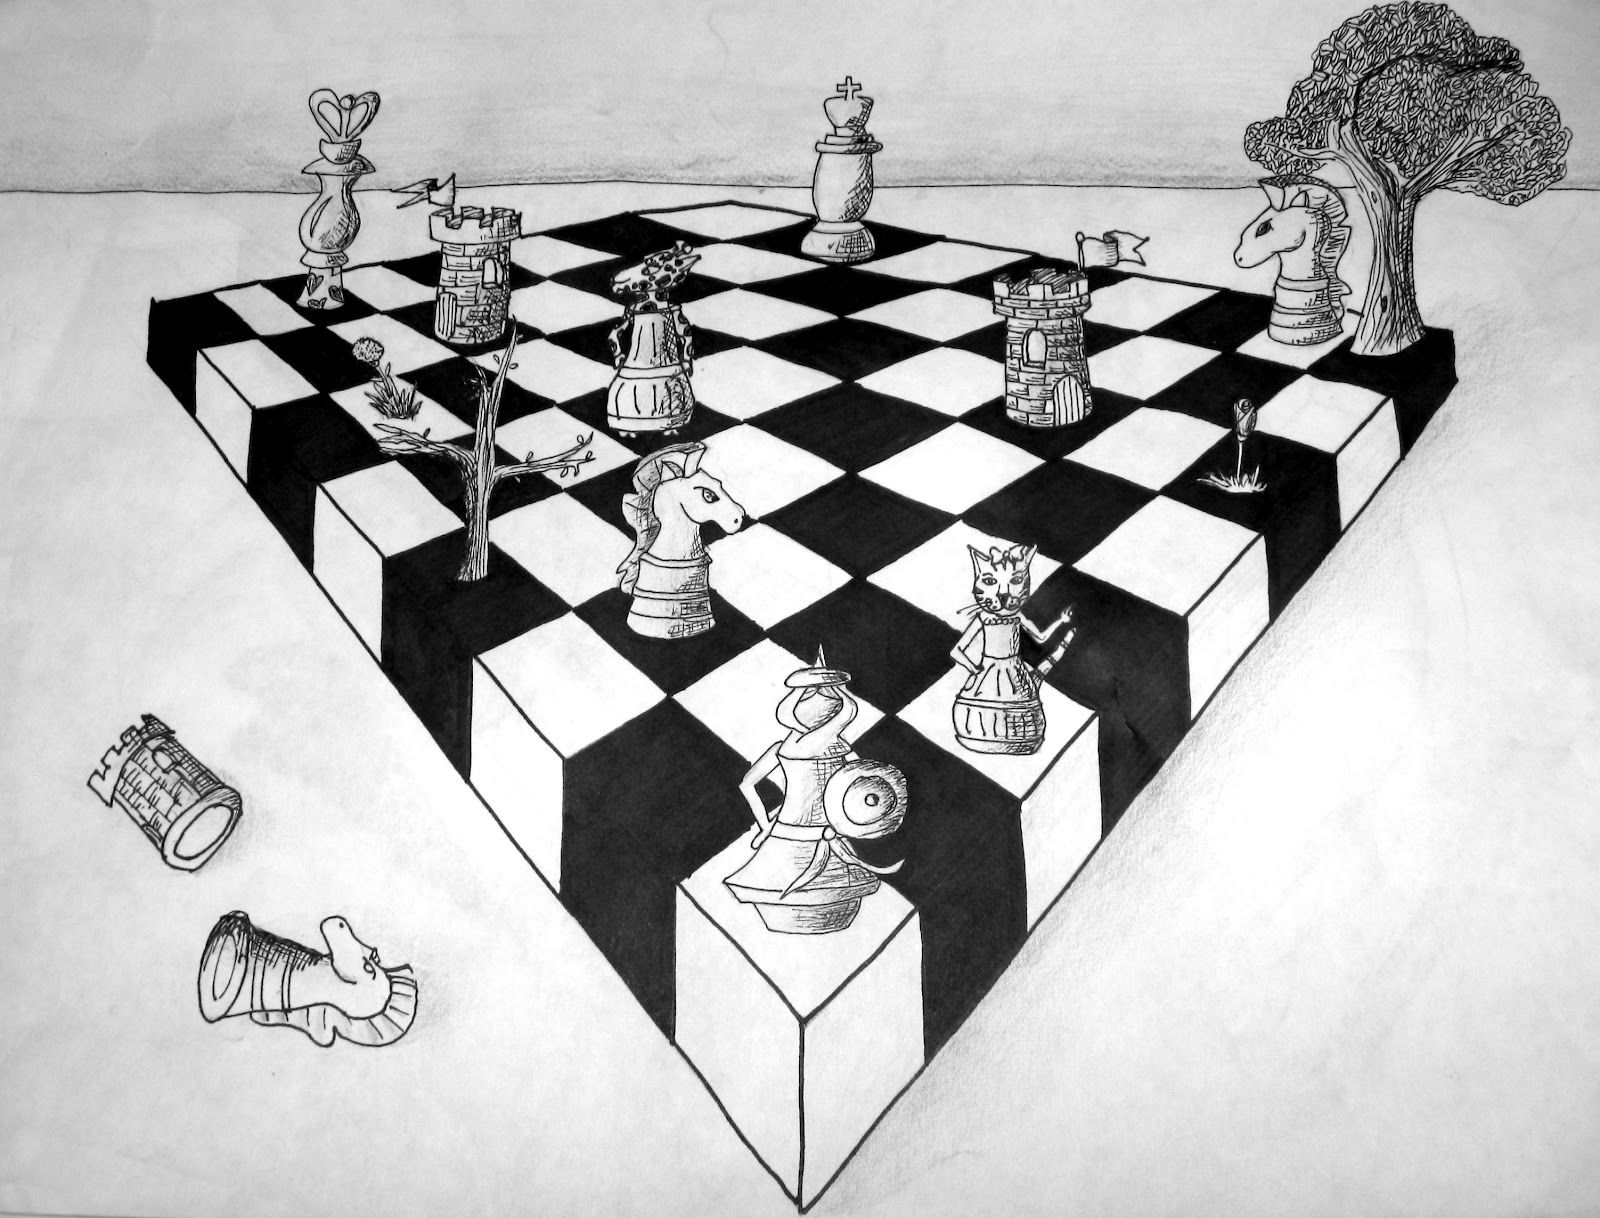 2 Pt Perspective Chessboard